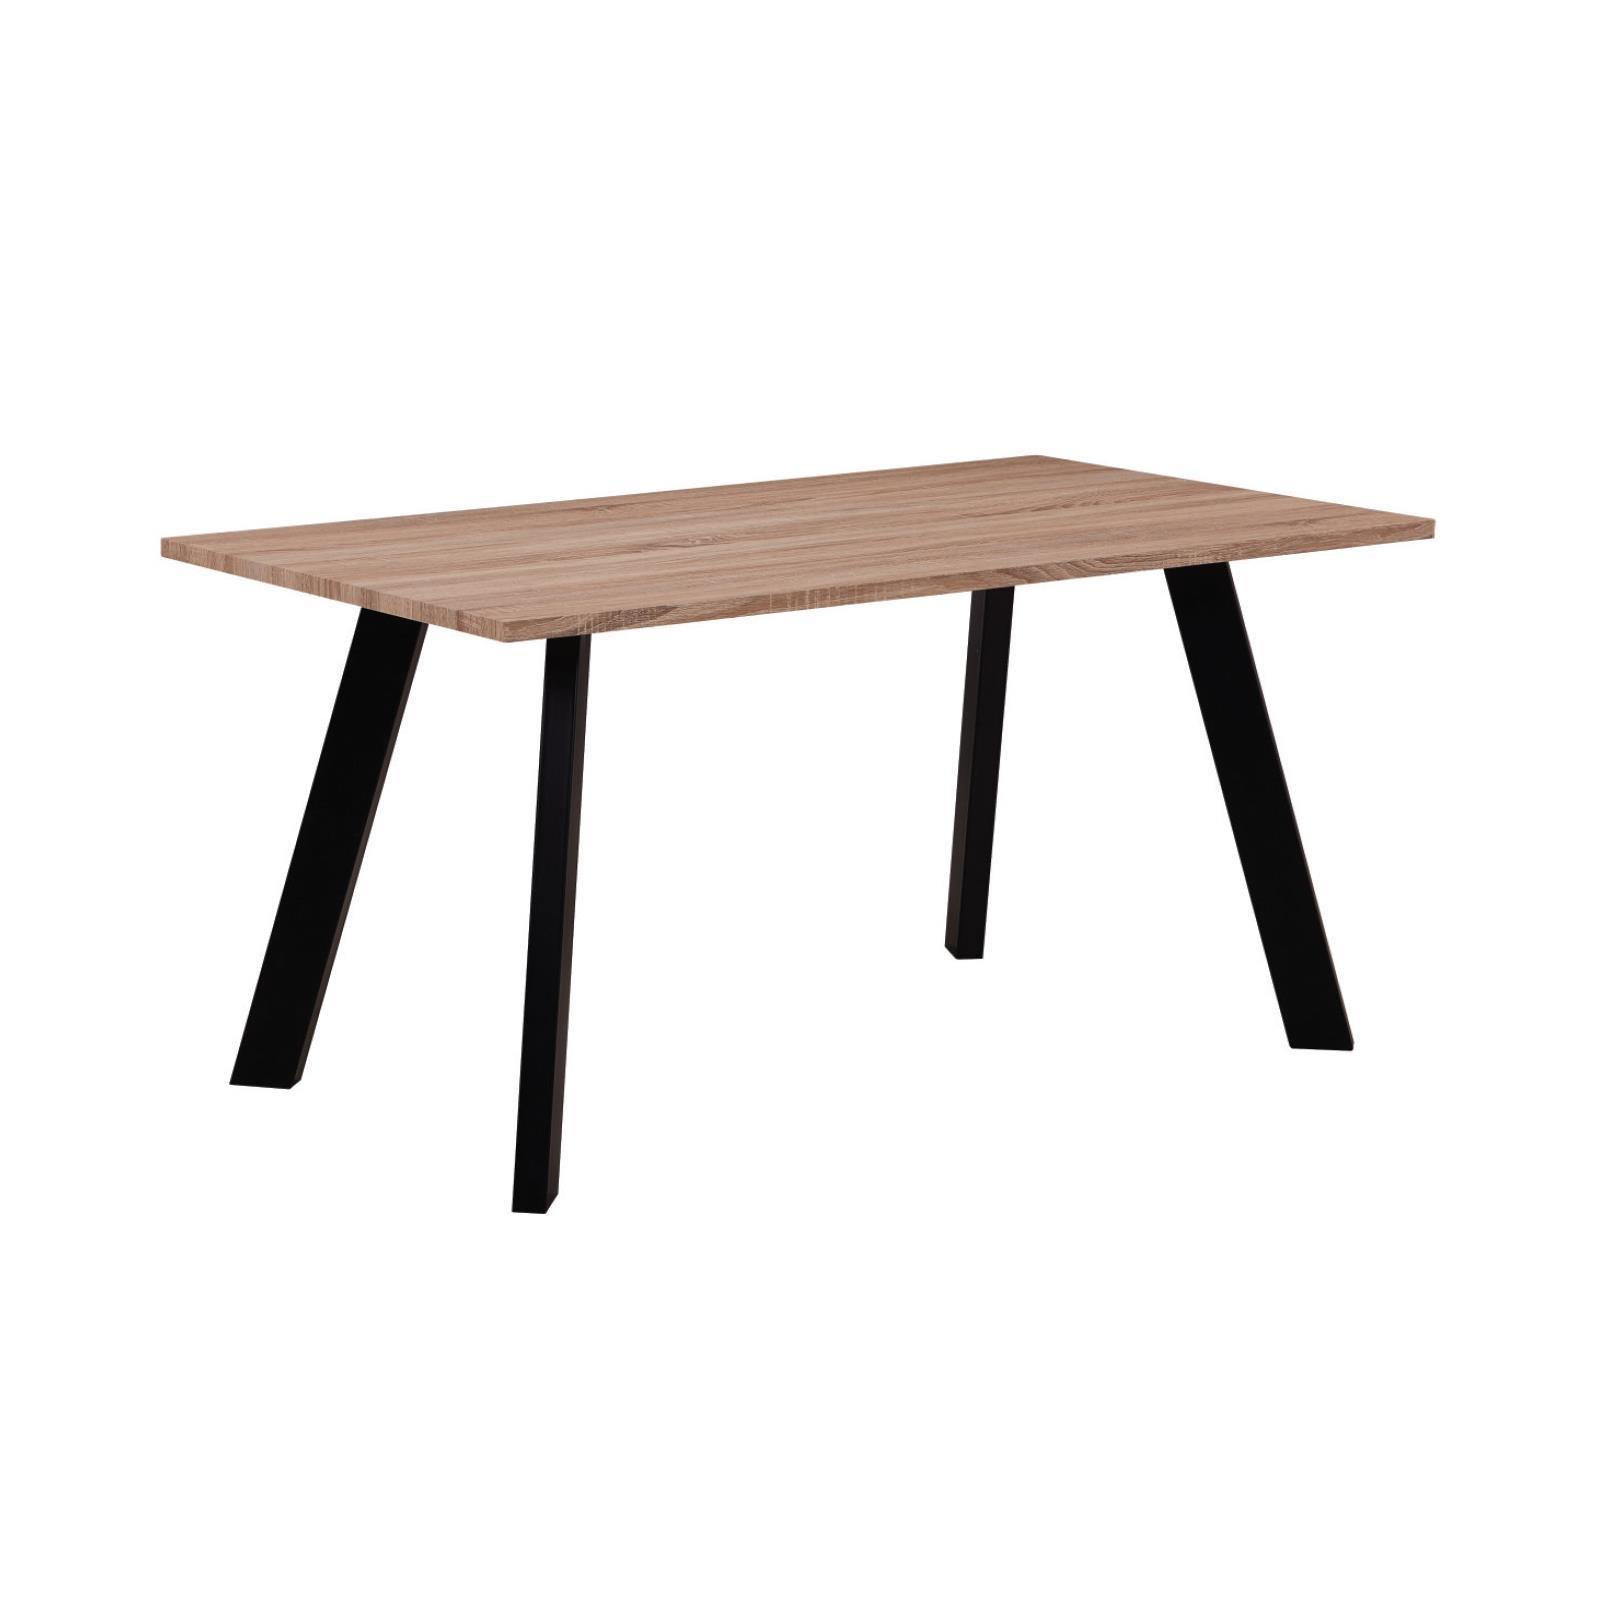 BAXTER τραπέζι sonoma με μεταλλικά πόδια μαύρα Υ75x120x70εκ.